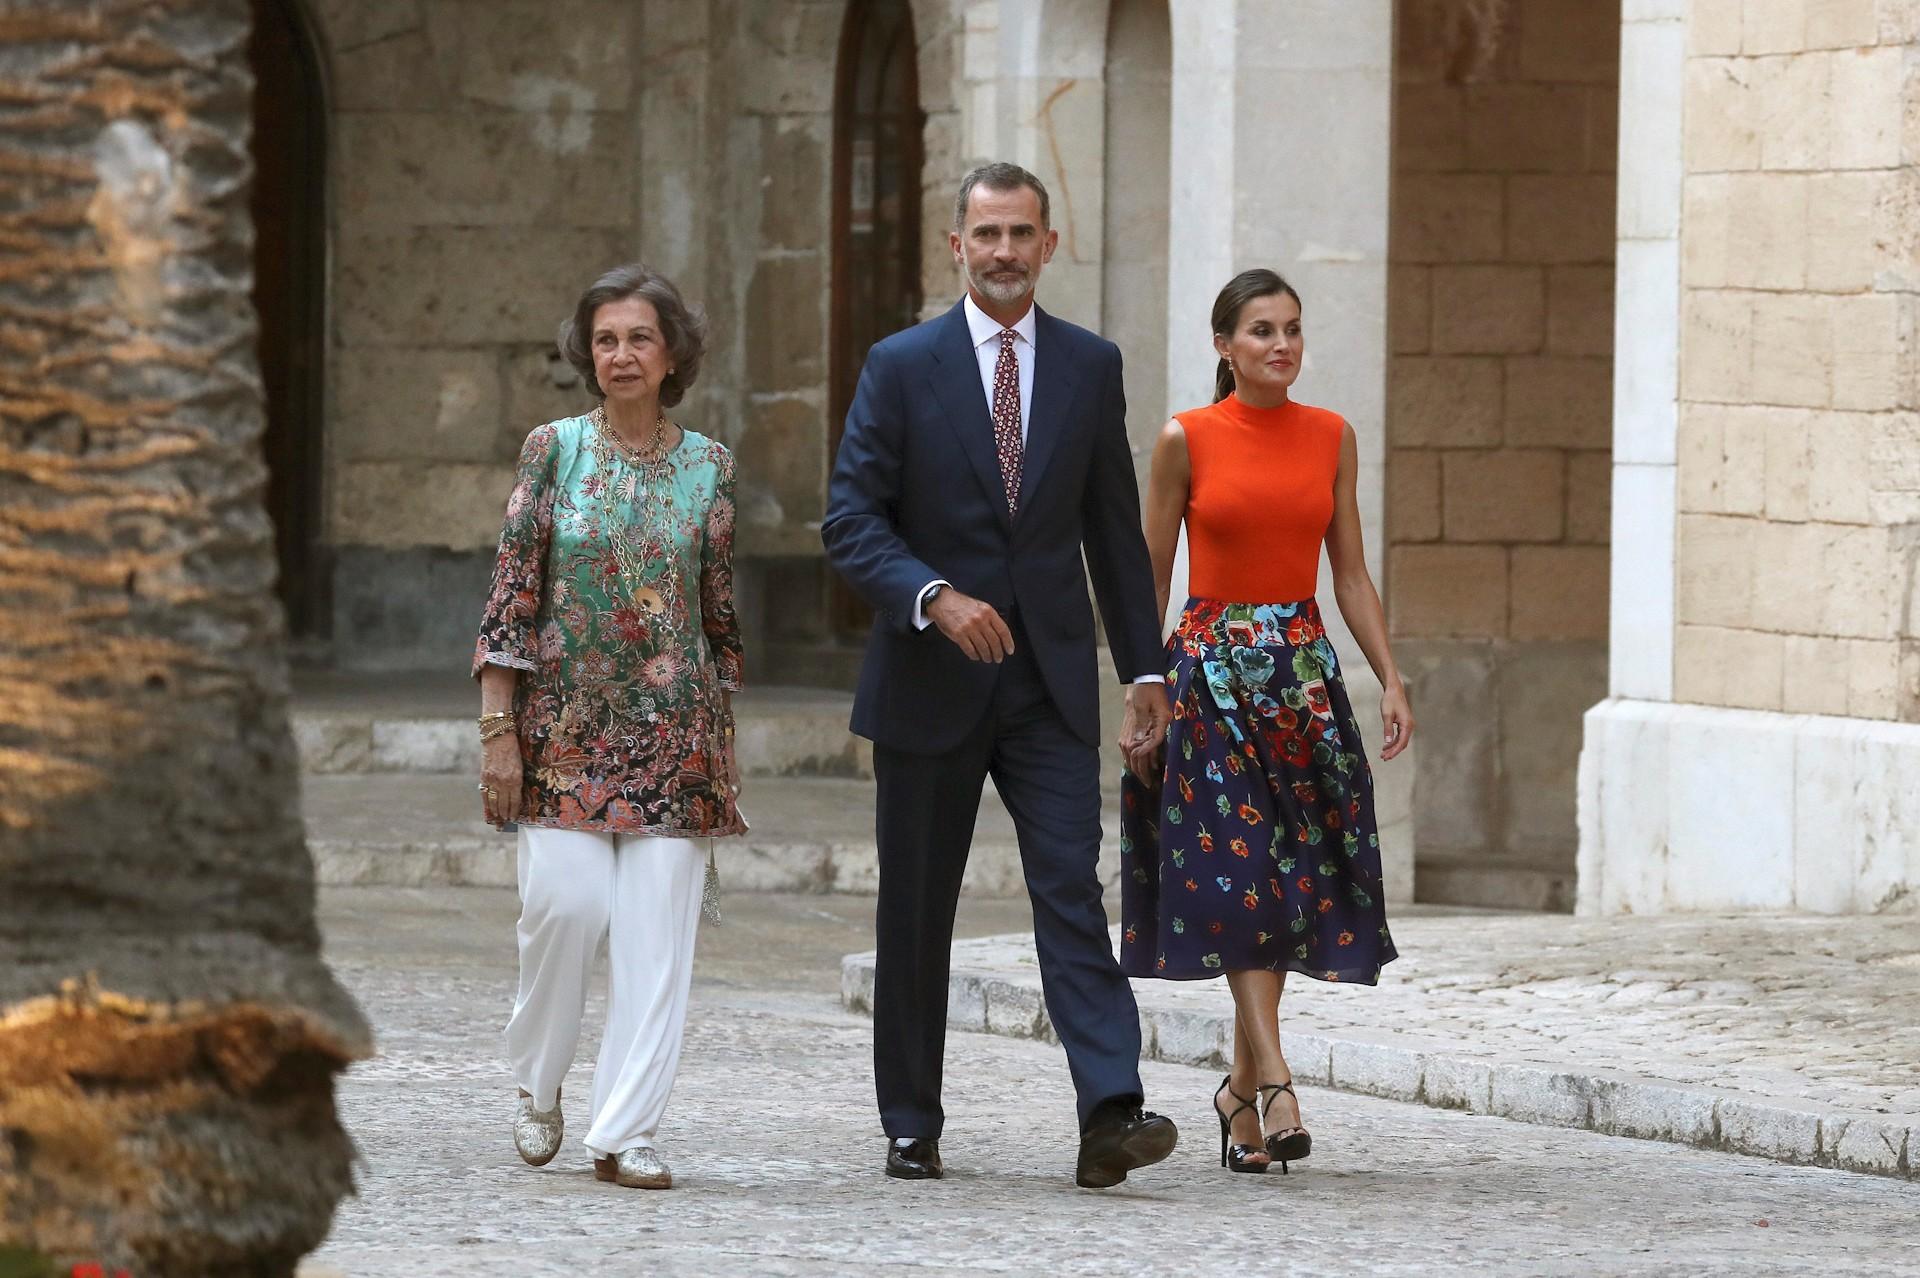 Acierto De Gimeno En Carlos Reina La Chic El Mallorca Pérez fgvyYIb76